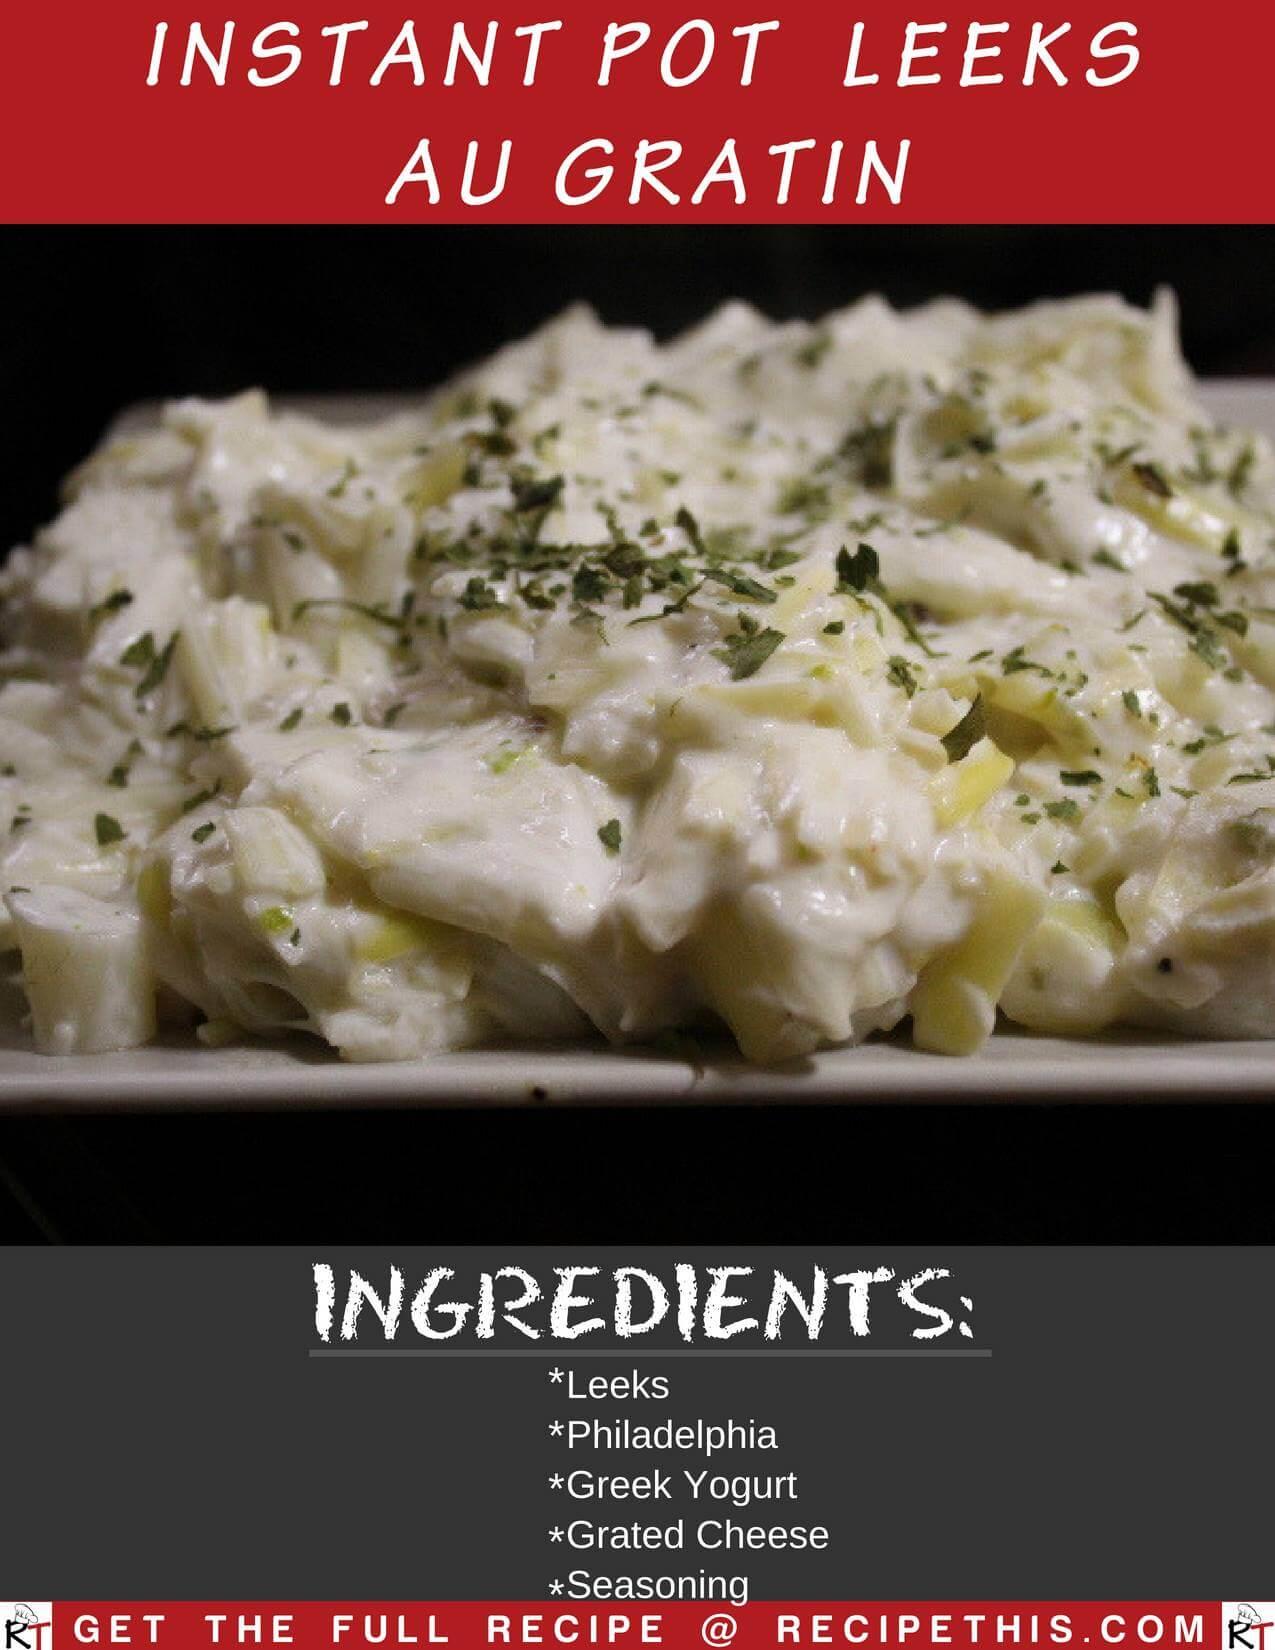 Instant Pot Leeks Au Gratin (Leeks In Cheese Sauce)